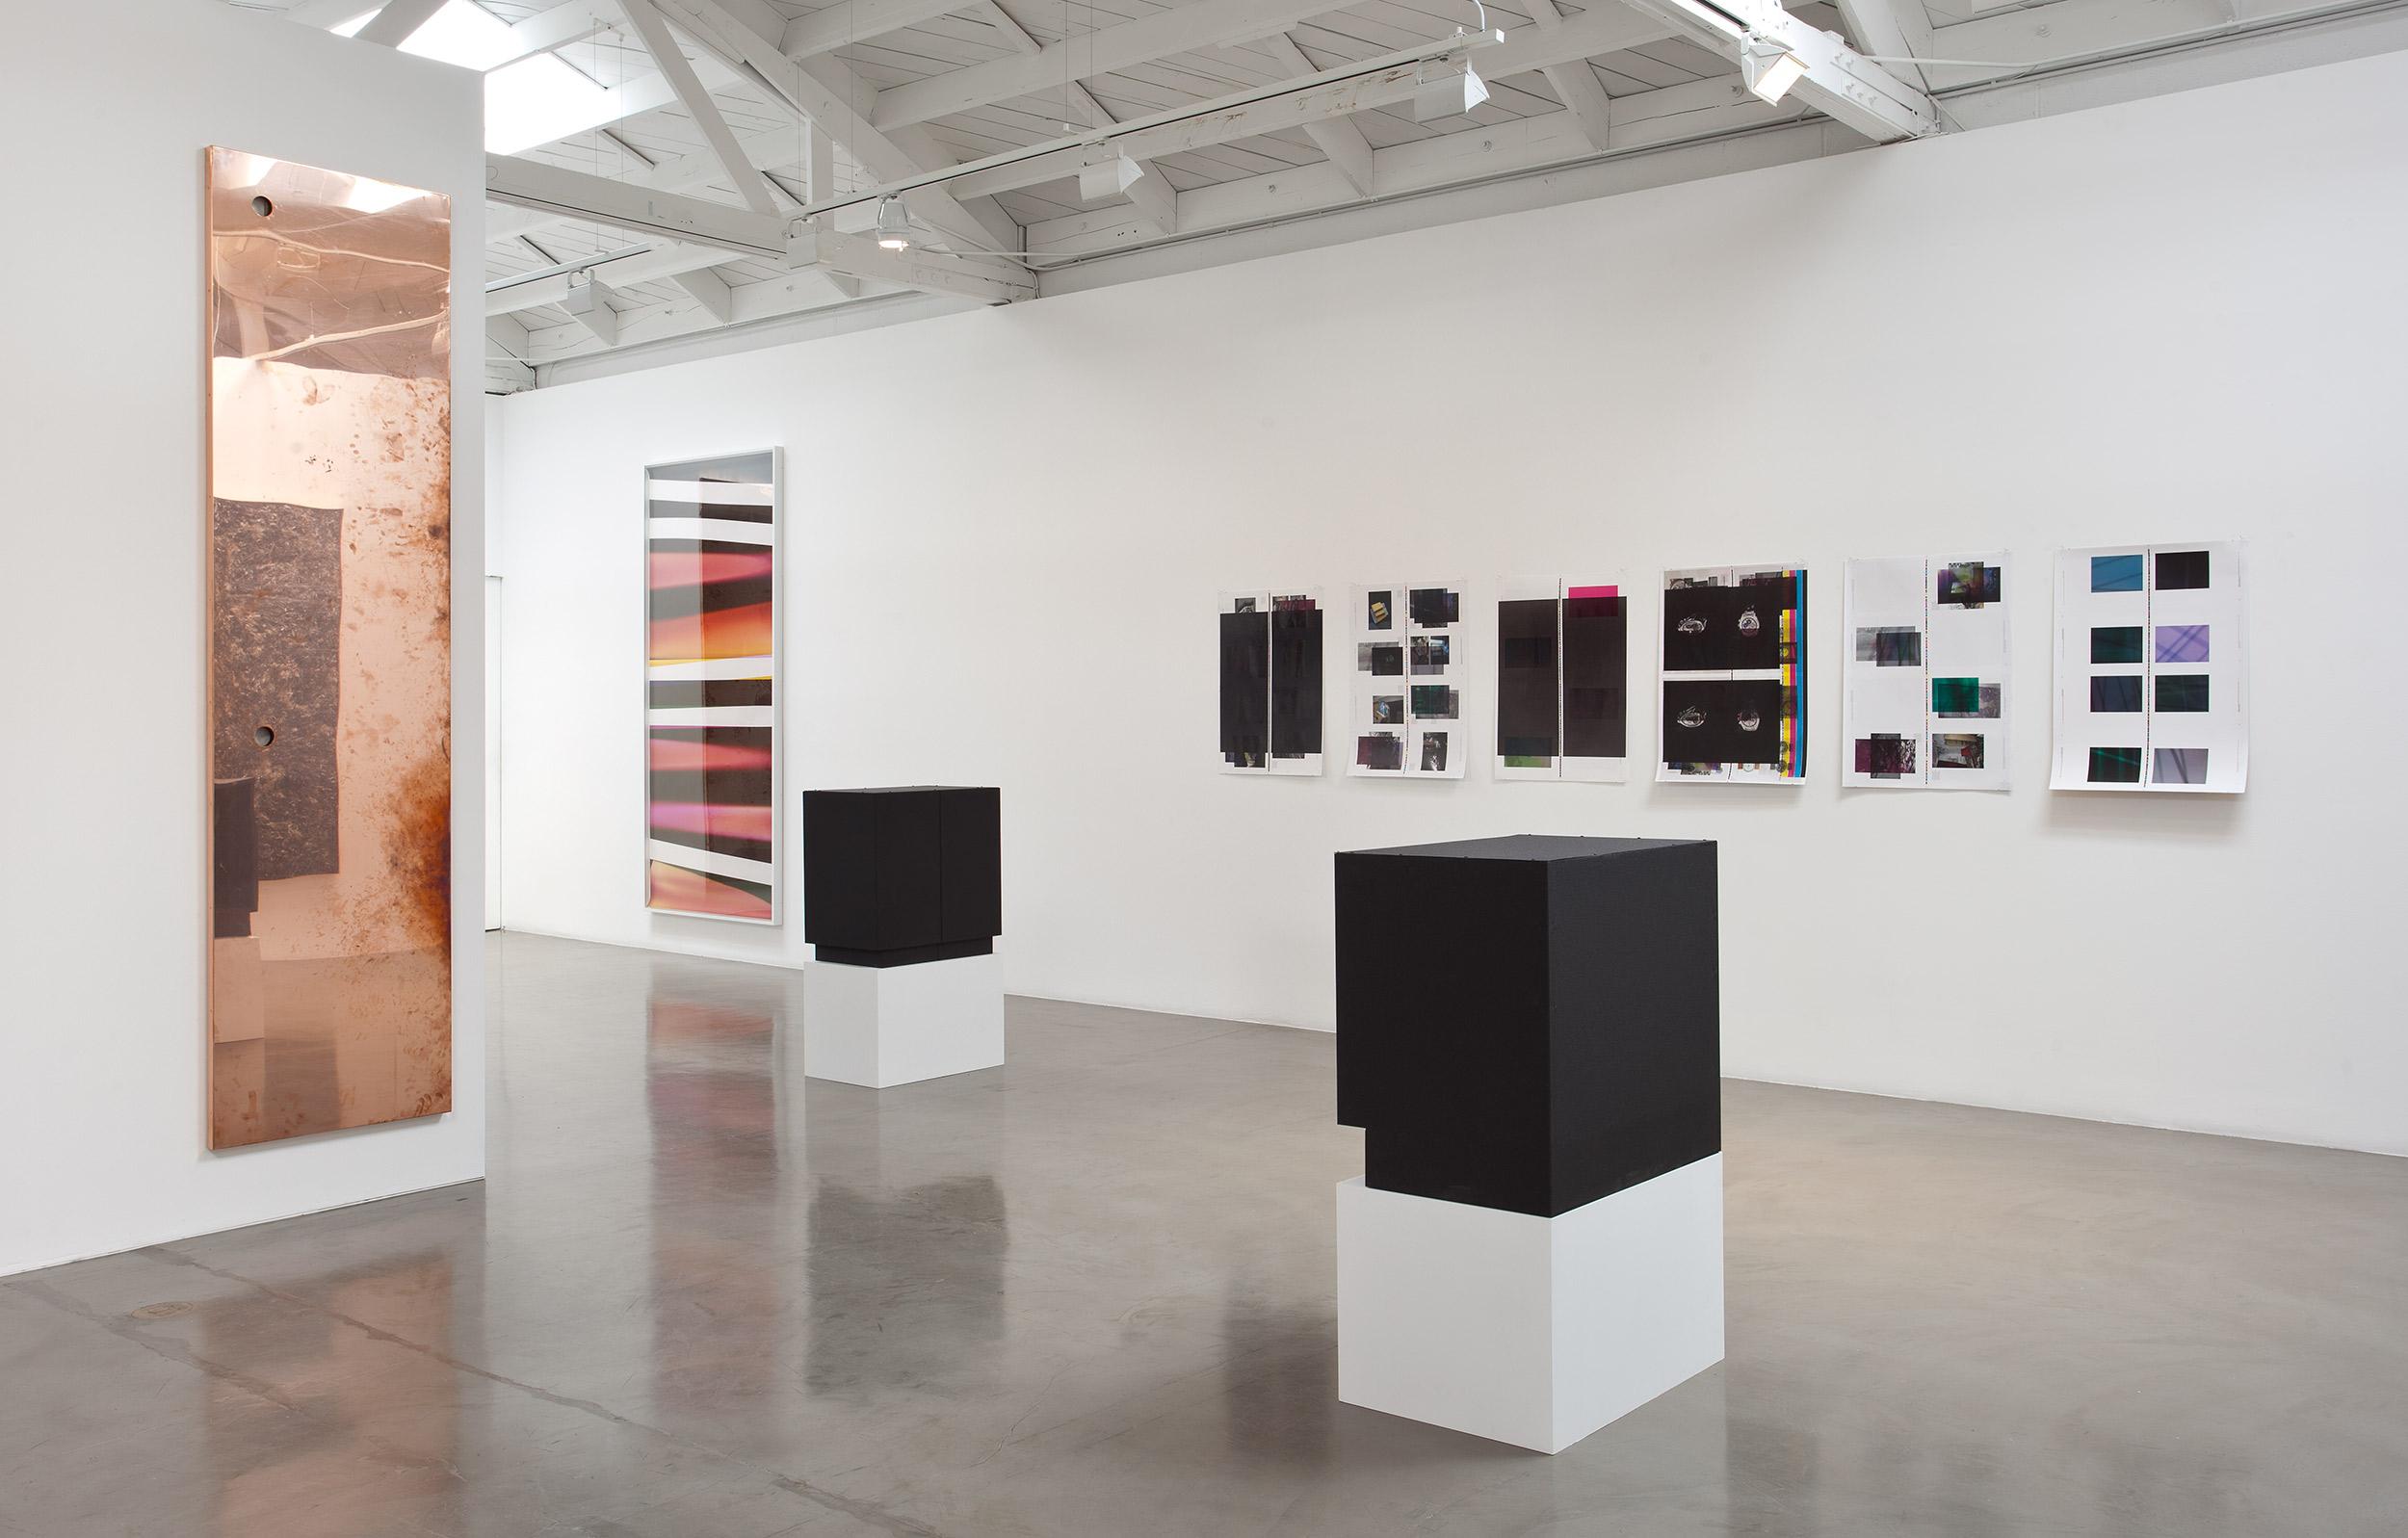 PROCESSCOLORFIELD   Regen Projects  Los Angeles  California  2011